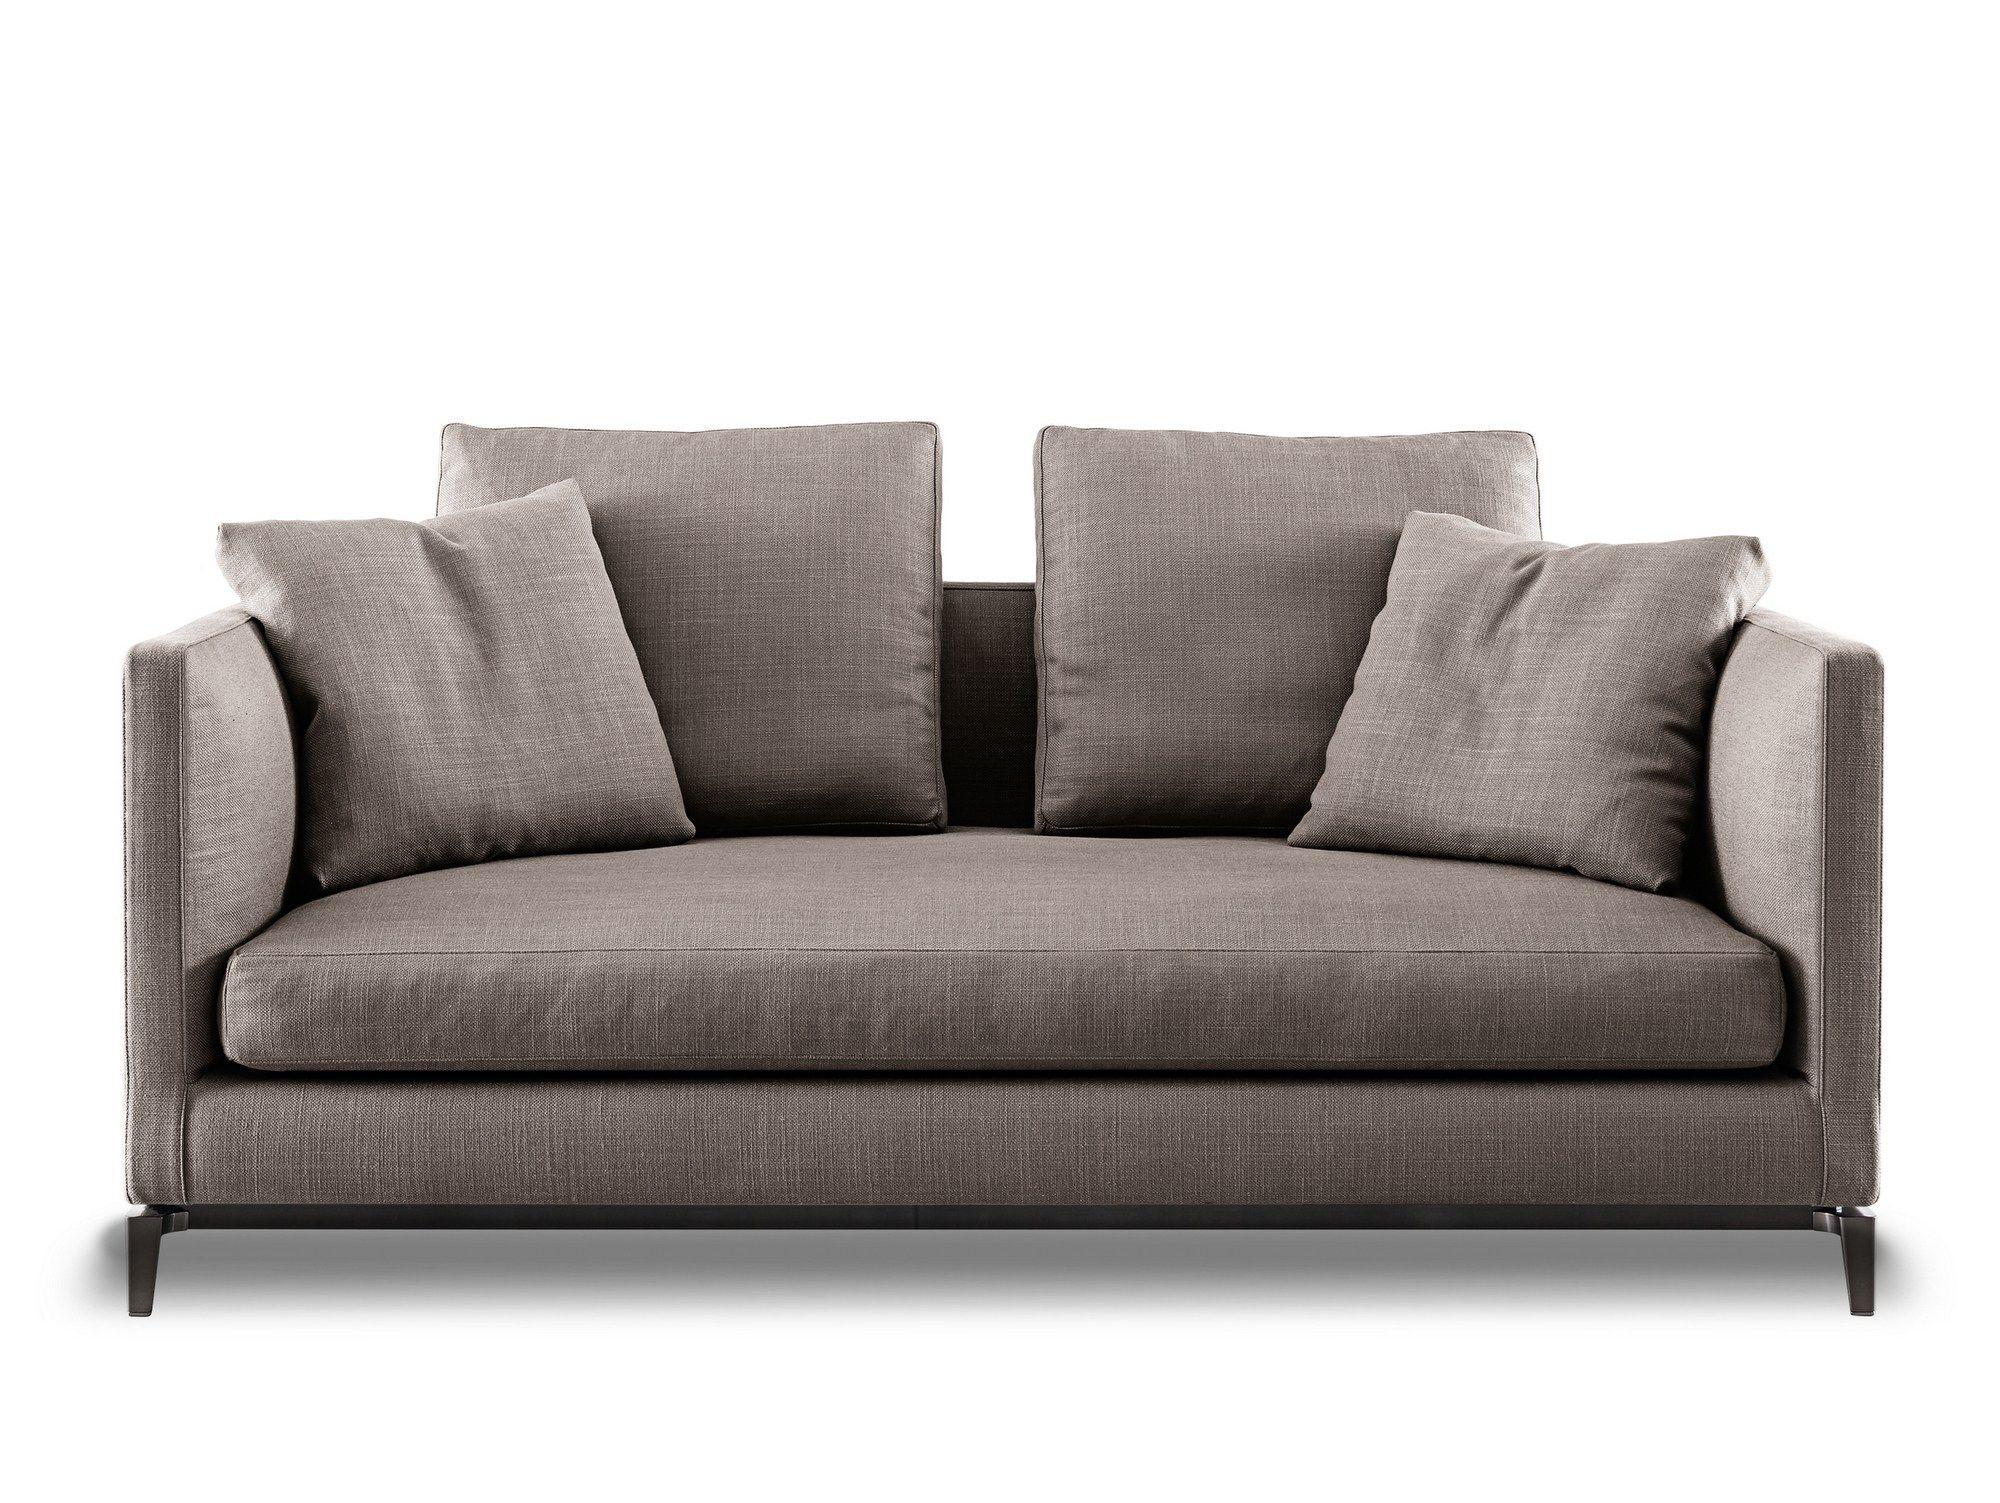 andersen slim 90 andersen slim 90 quilt by minotti design. Black Bedroom Furniture Sets. Home Design Ideas